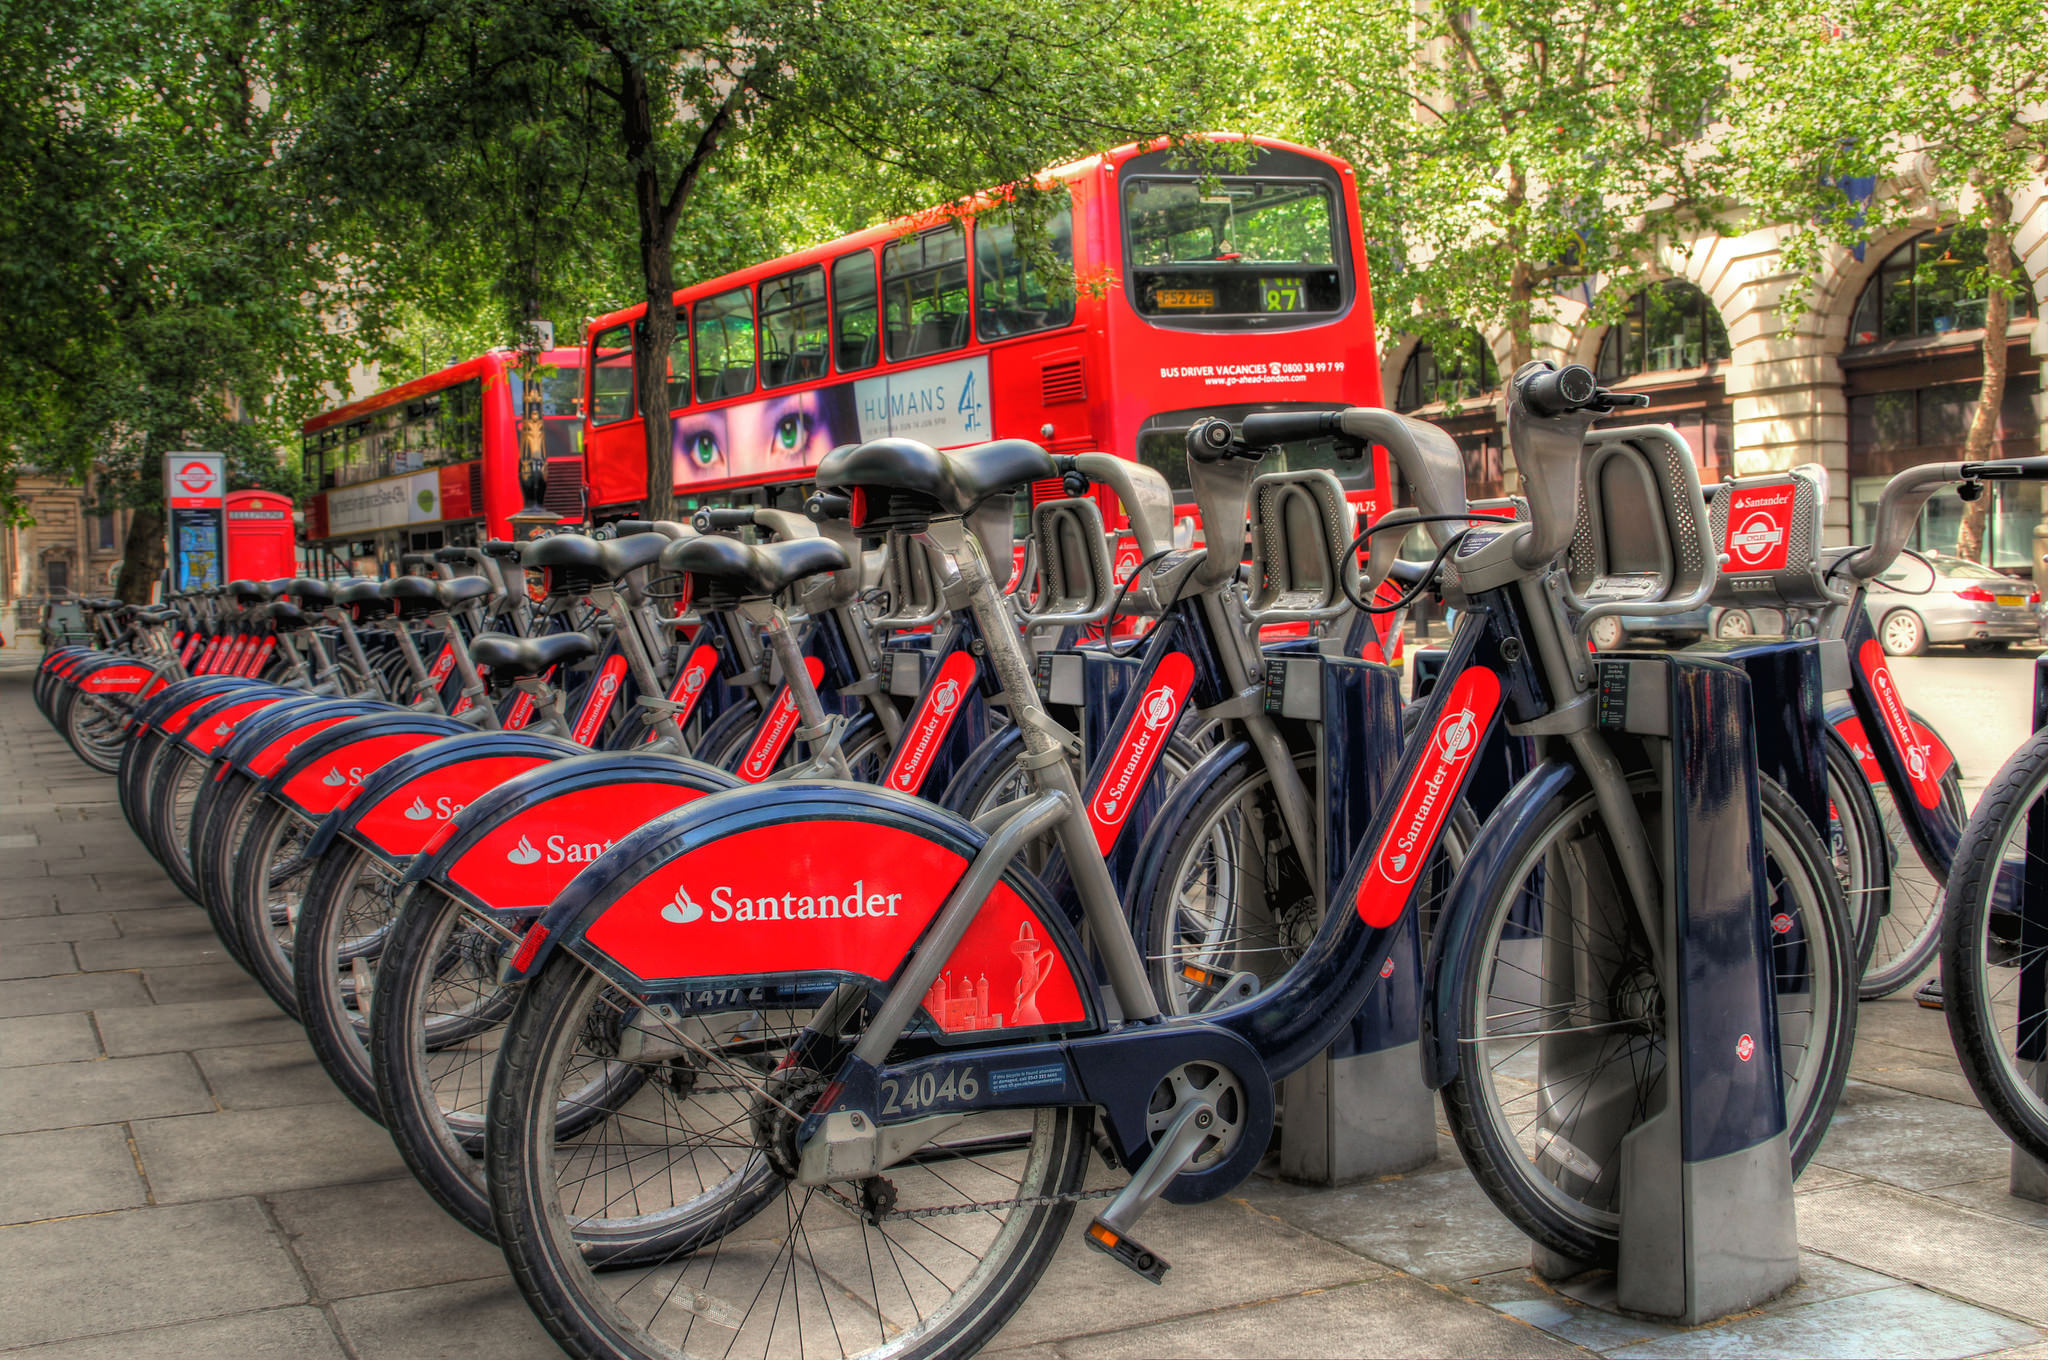 Santander bike hire